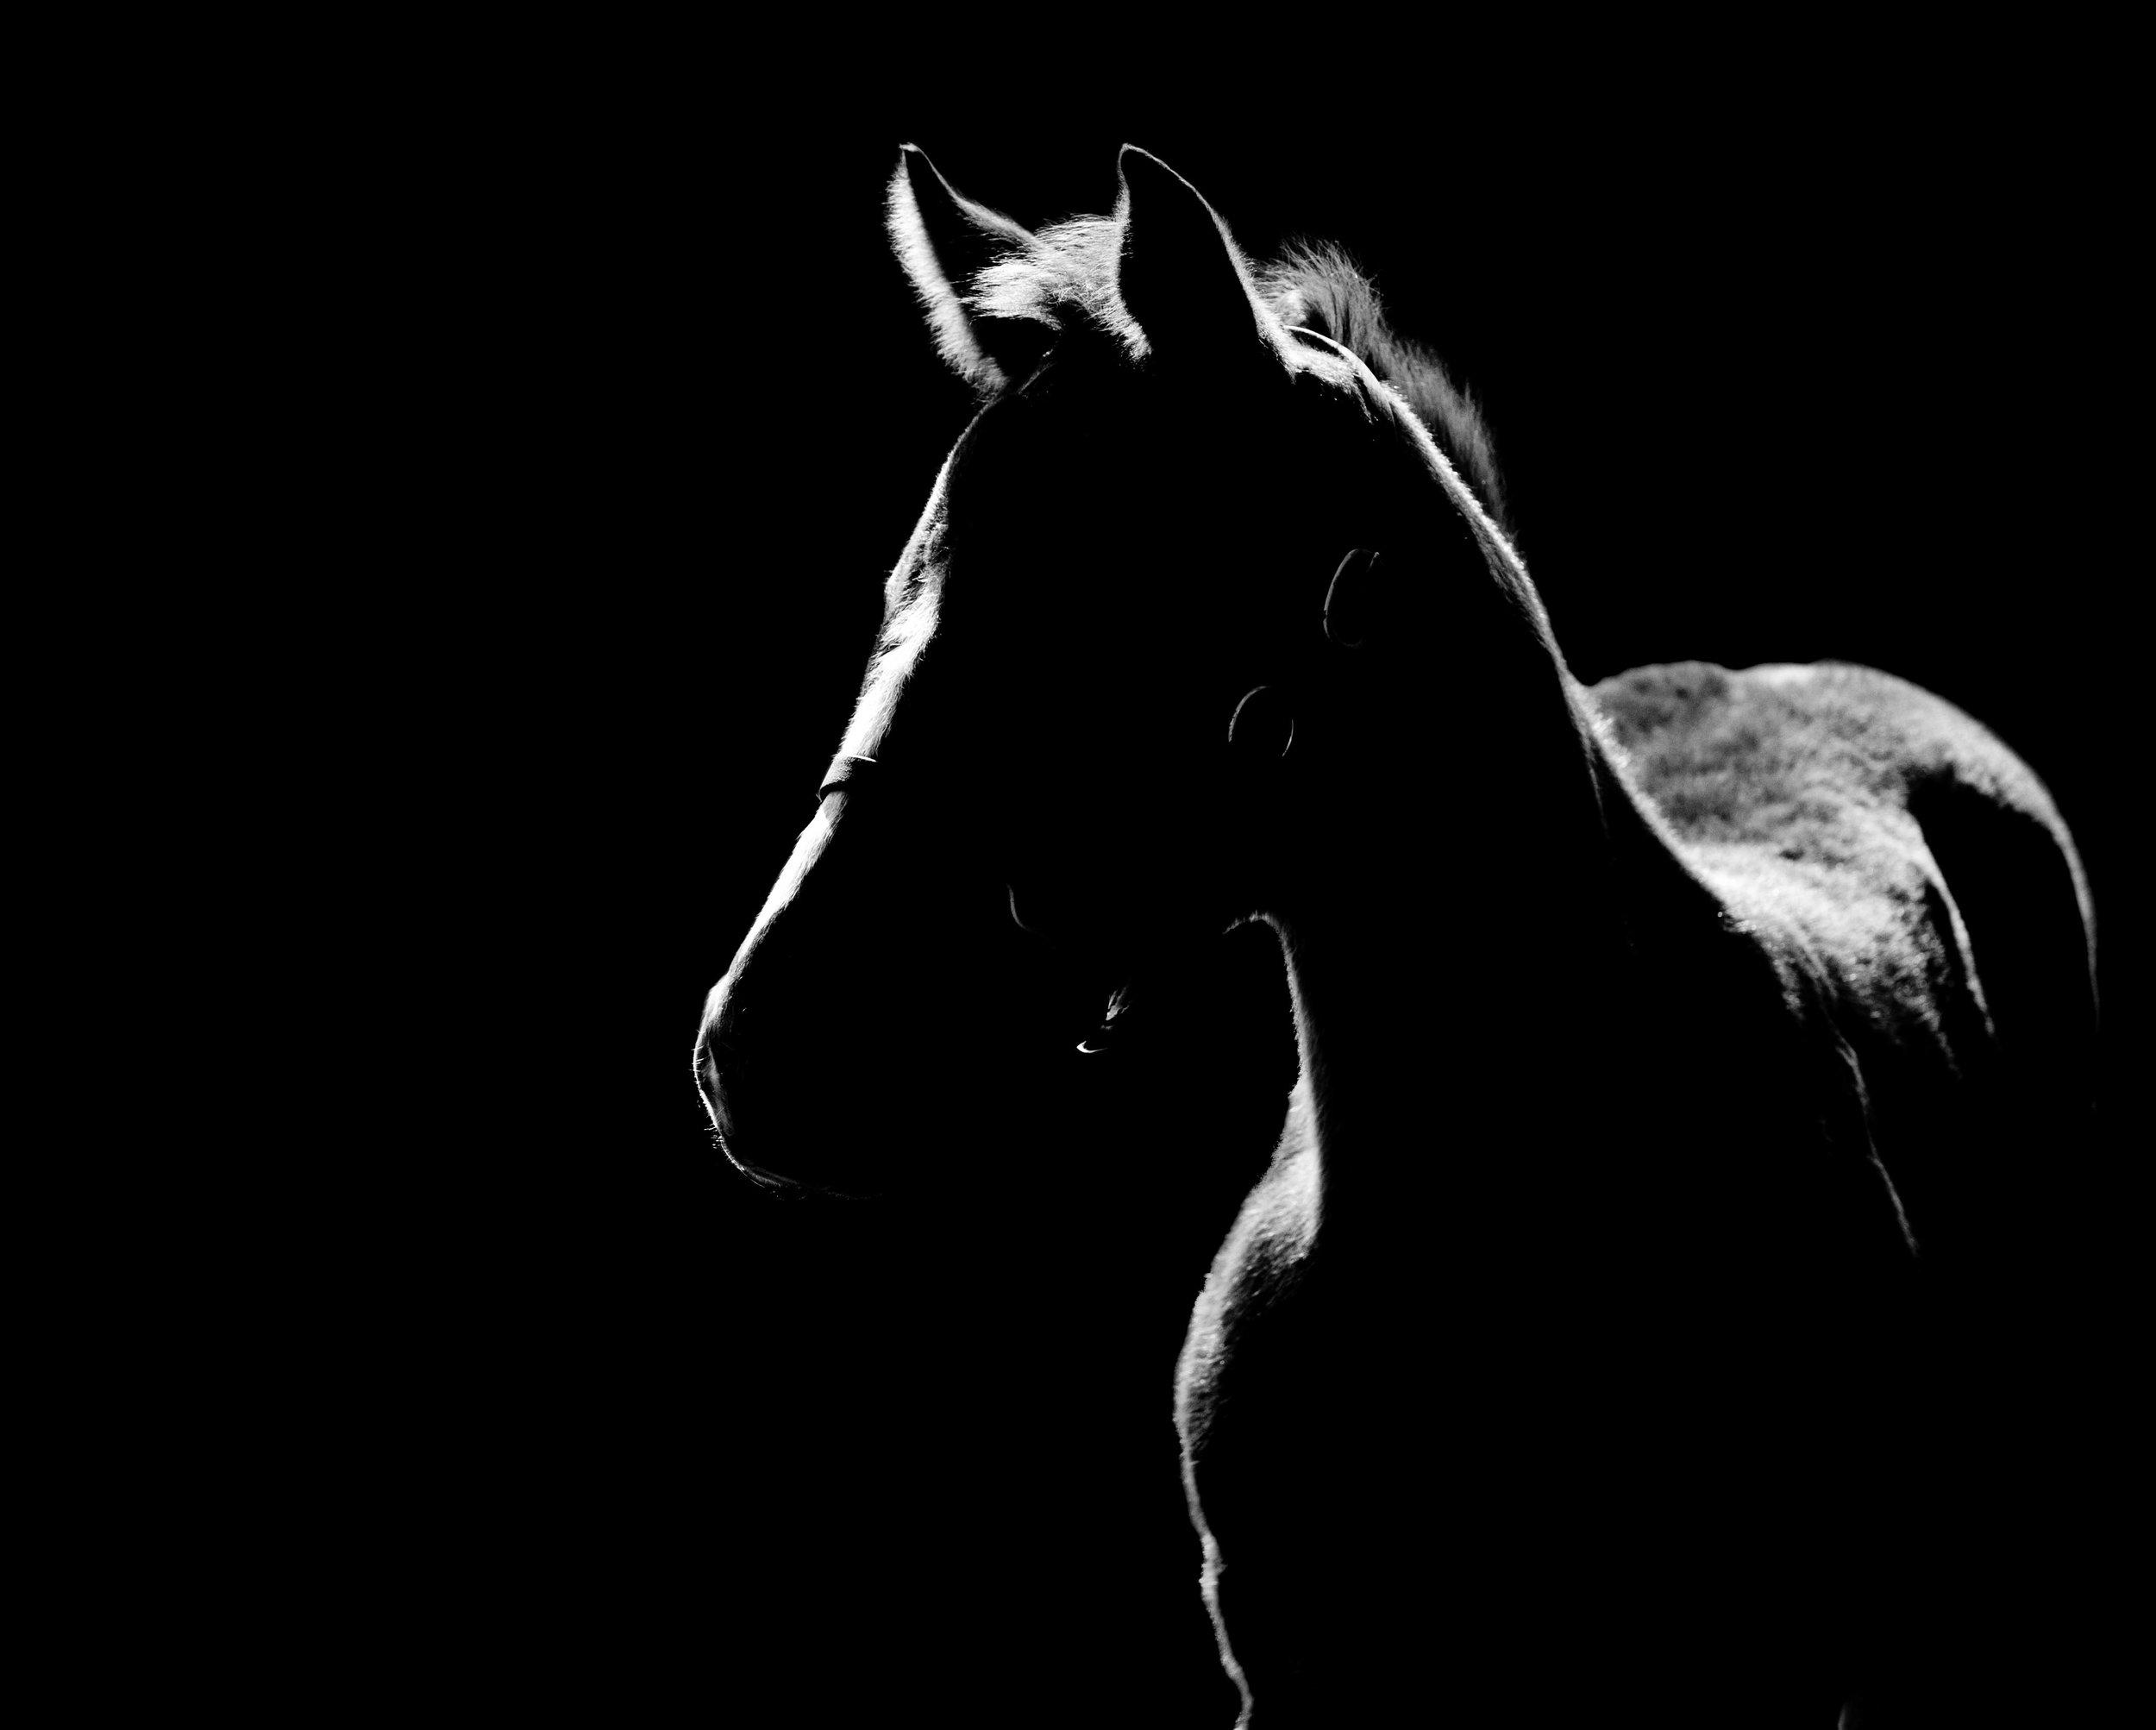 foals-4981.jpg